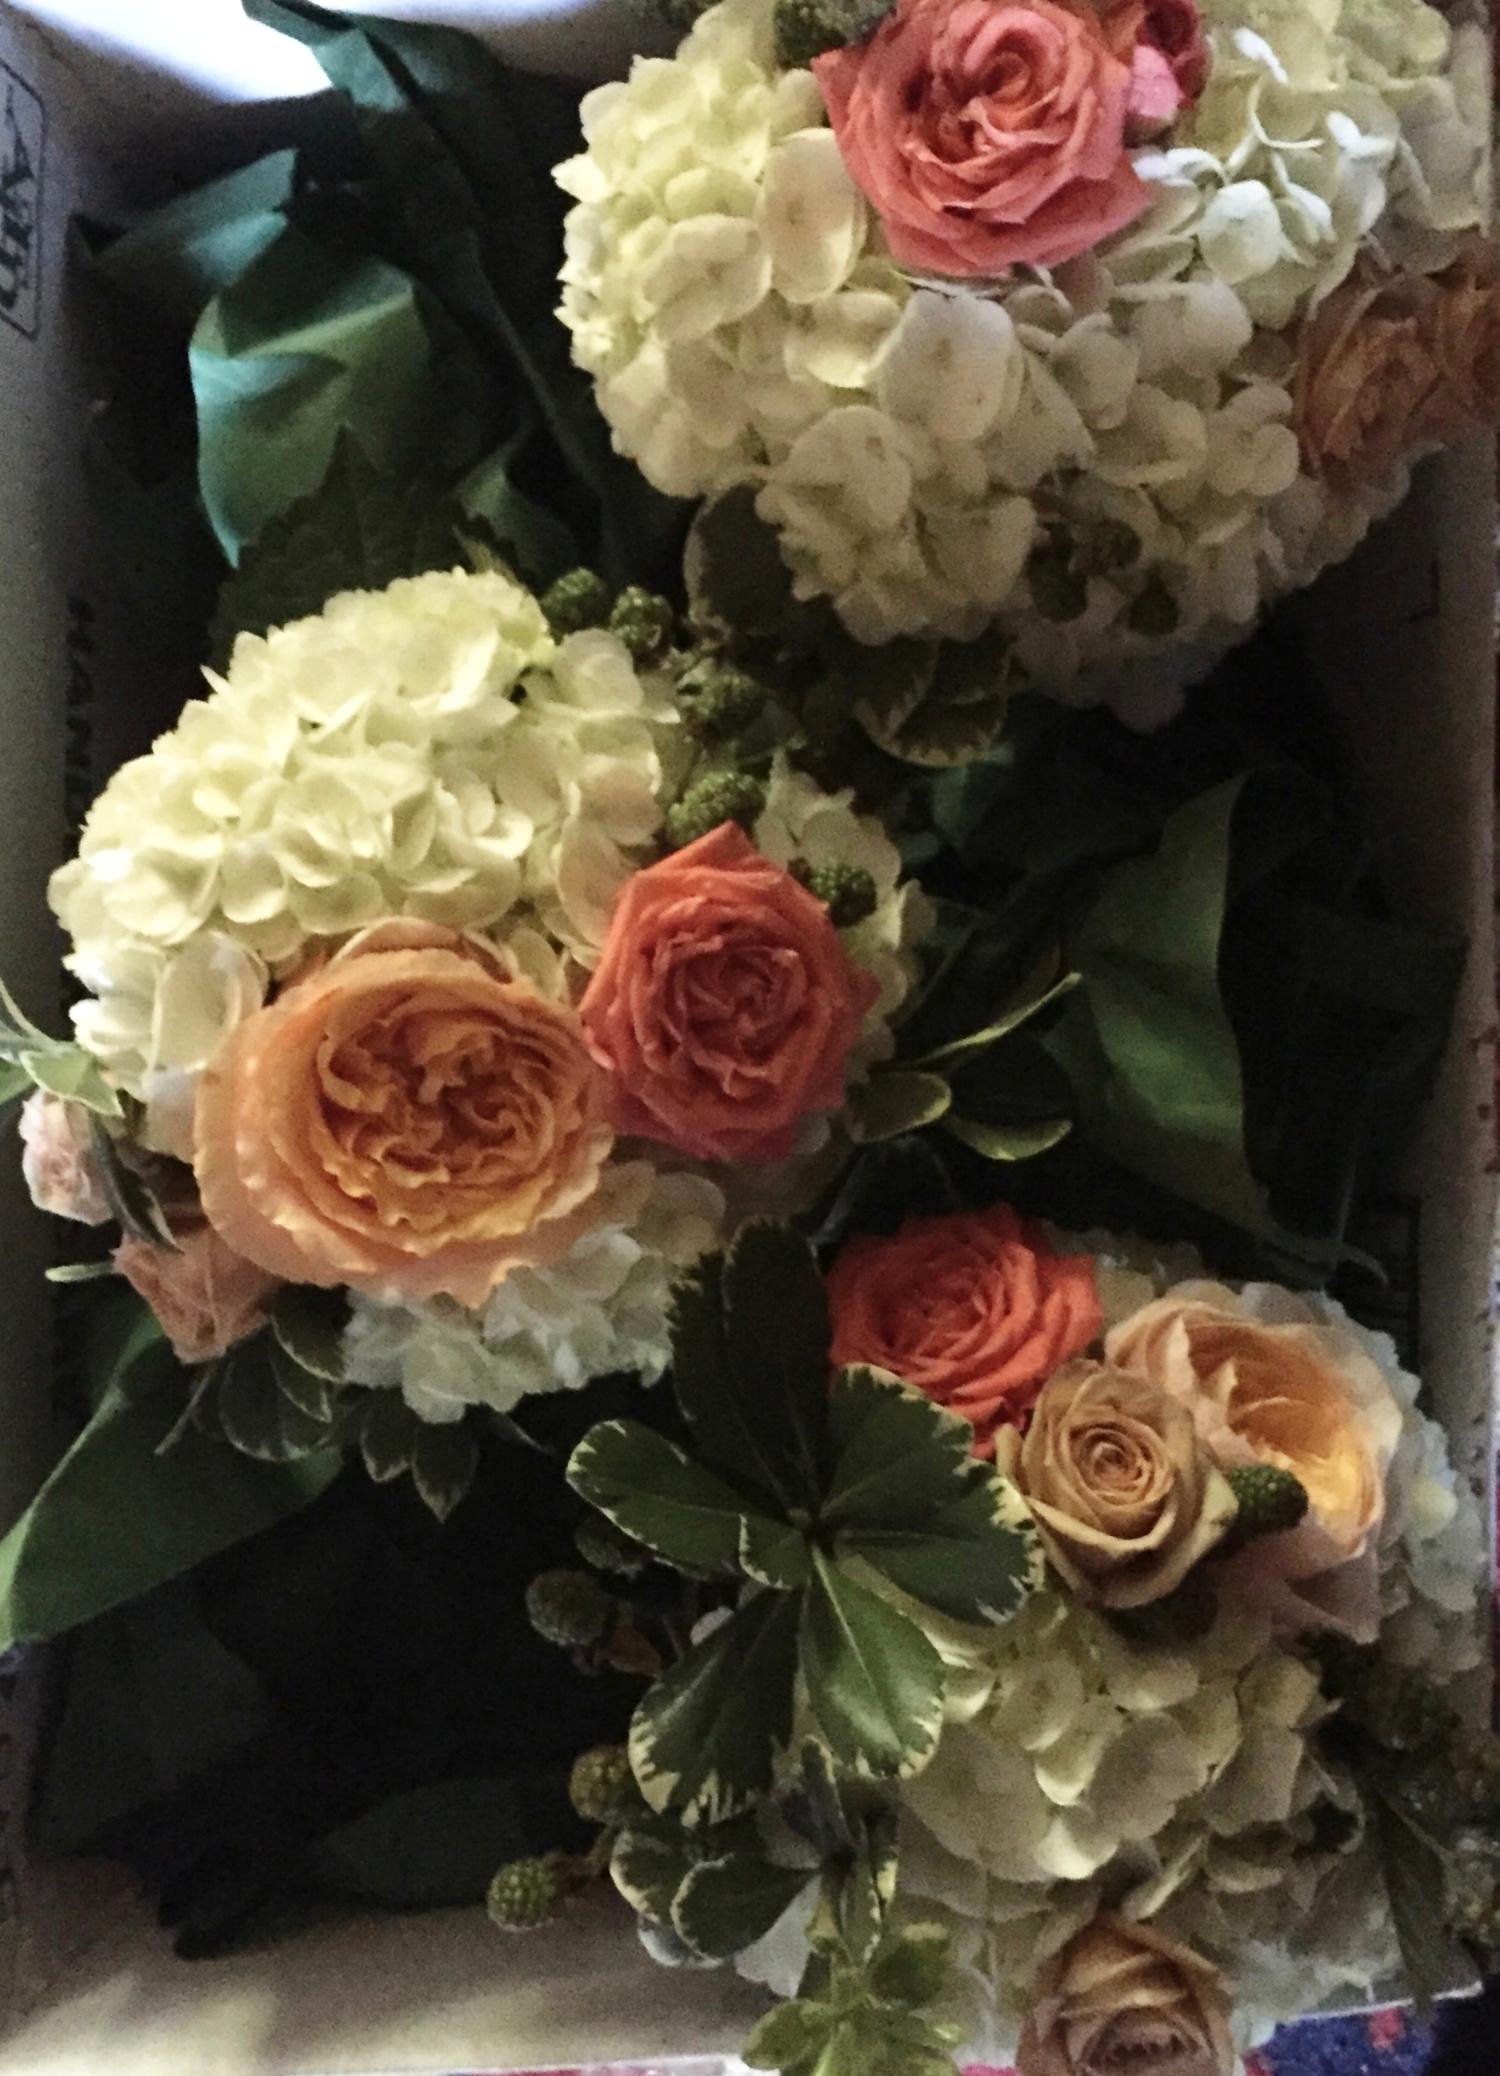 Simple hydrangea centerpieces with garden roses